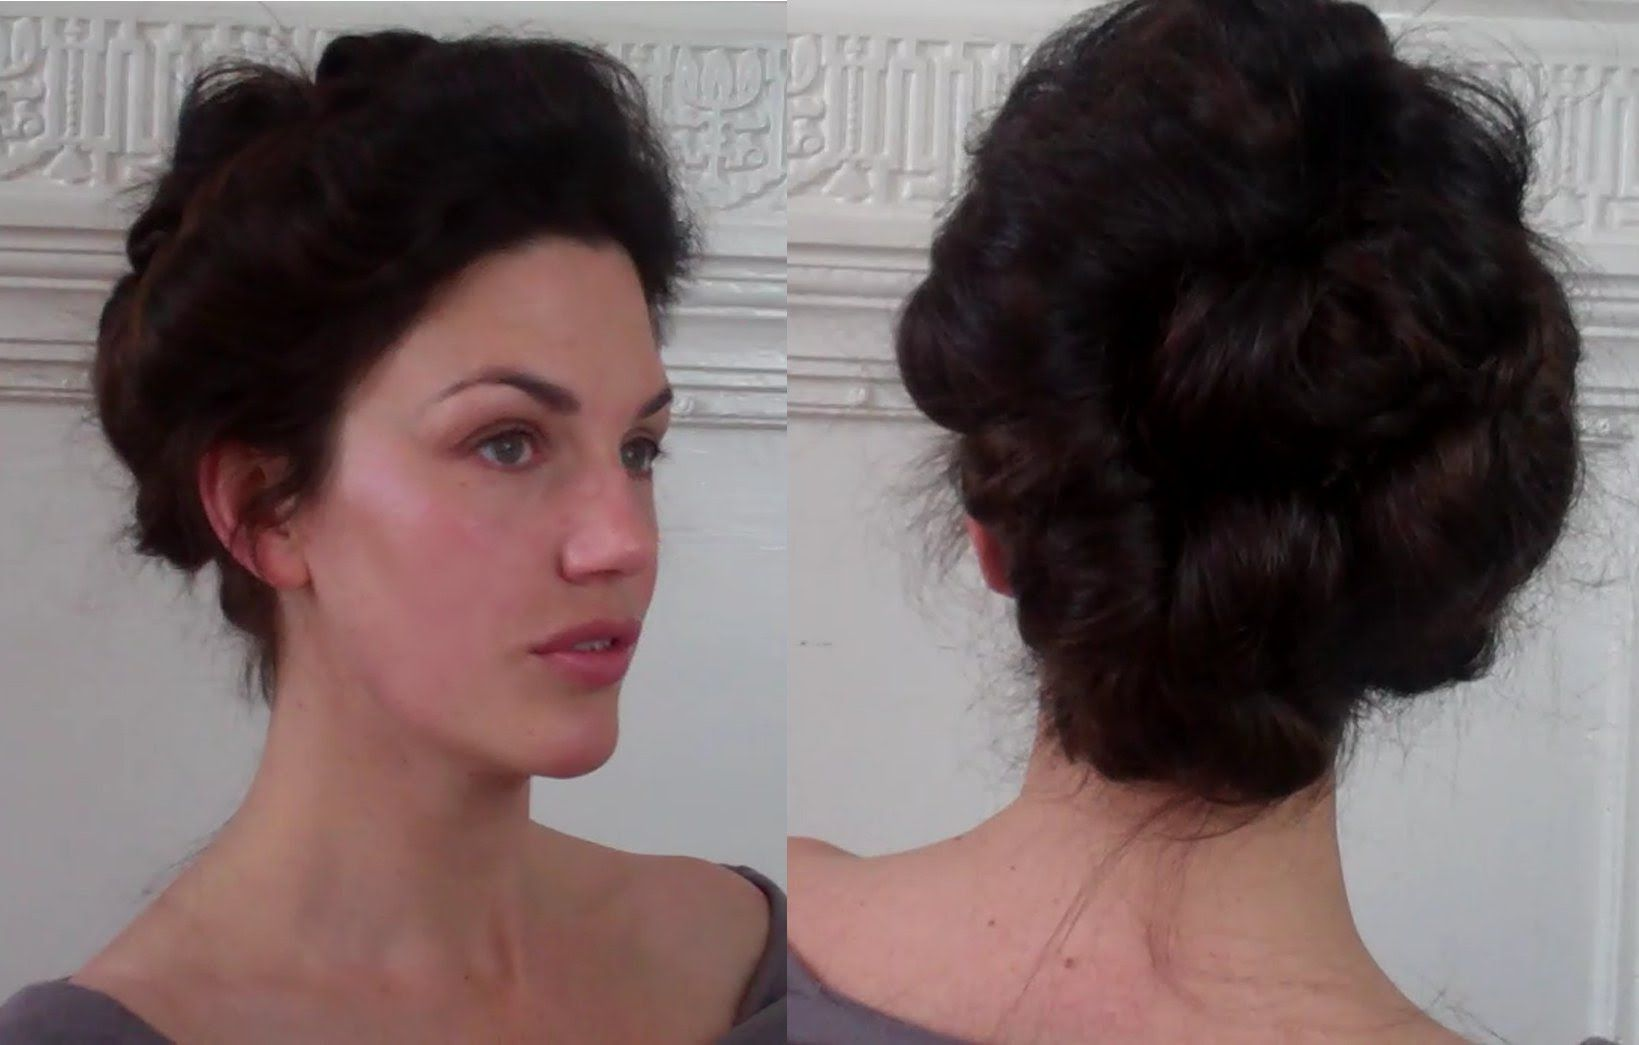 Pompadour puffs an edwardian updo tutorial meduim long how to gibson girl hair edwardian victorian vintage retro hairstyle tutorial vintagious baditri Gallery